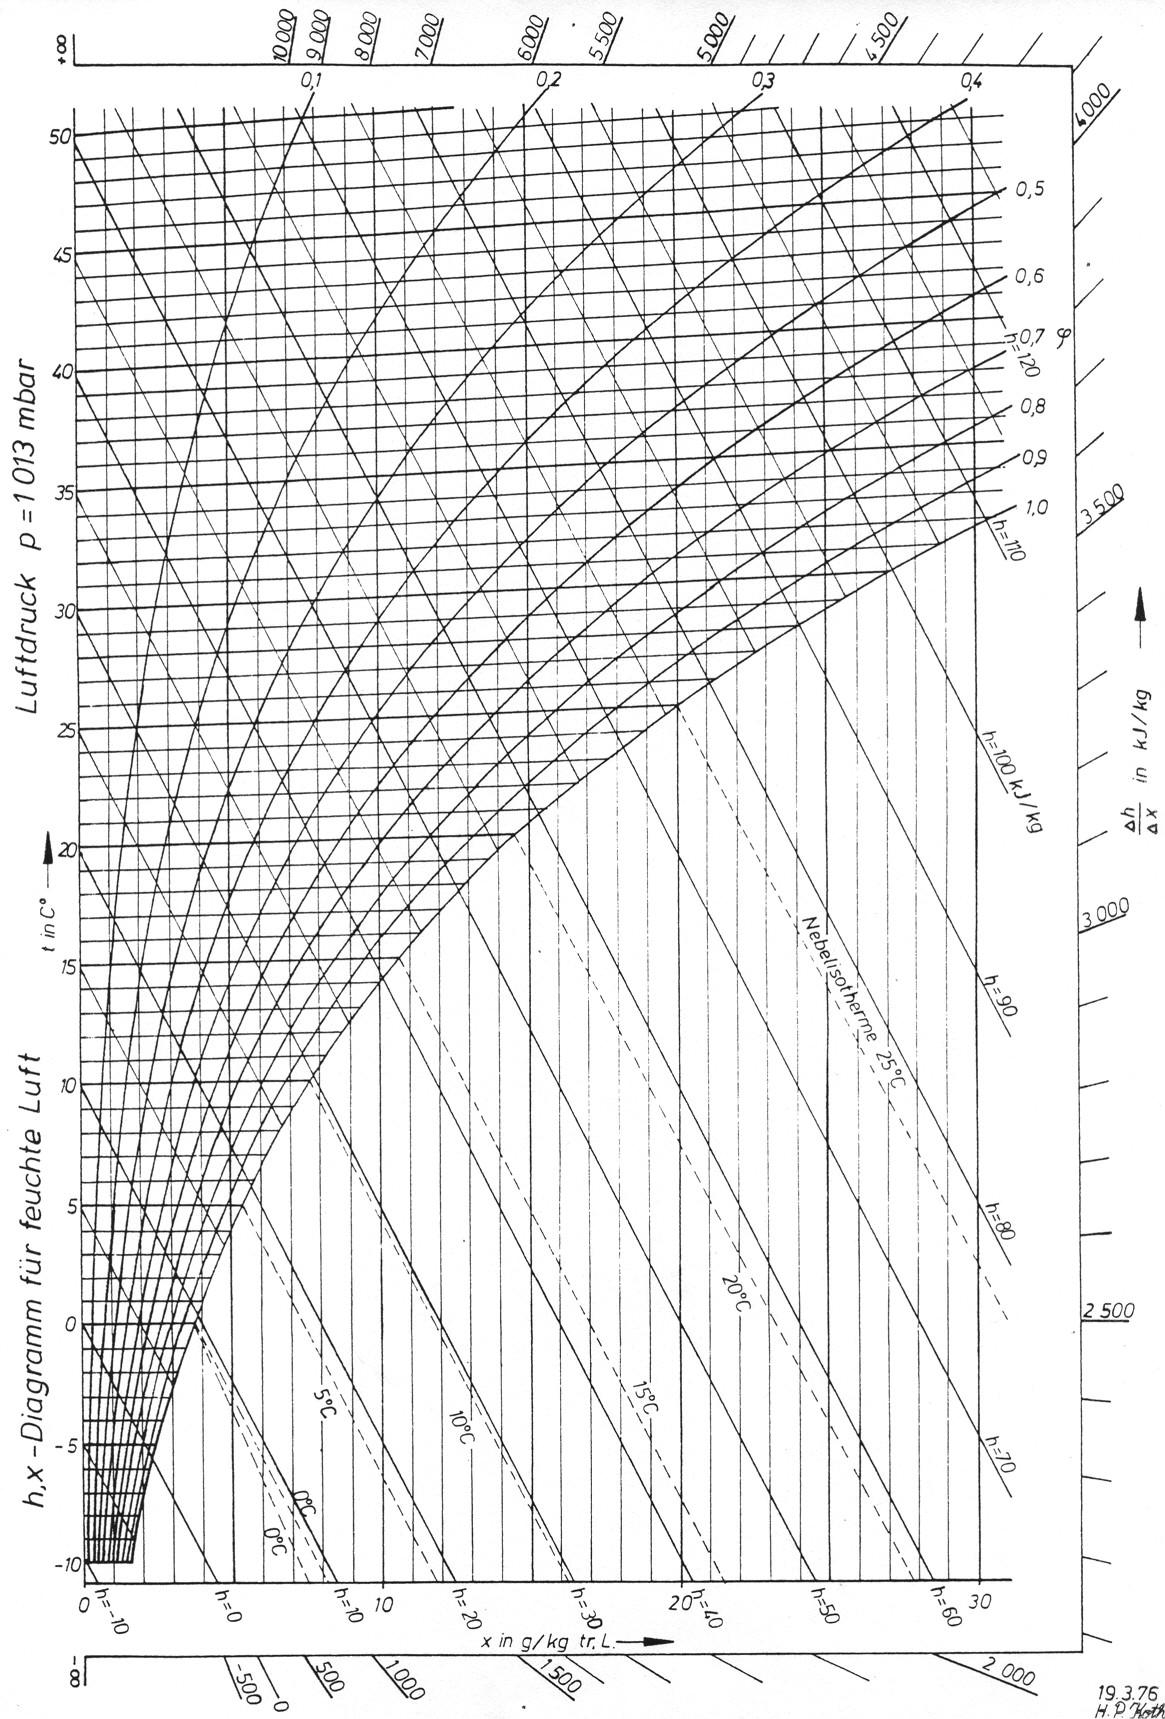 Mollier H X Diagramm Als Bild Mollier H X Diagramm Fa